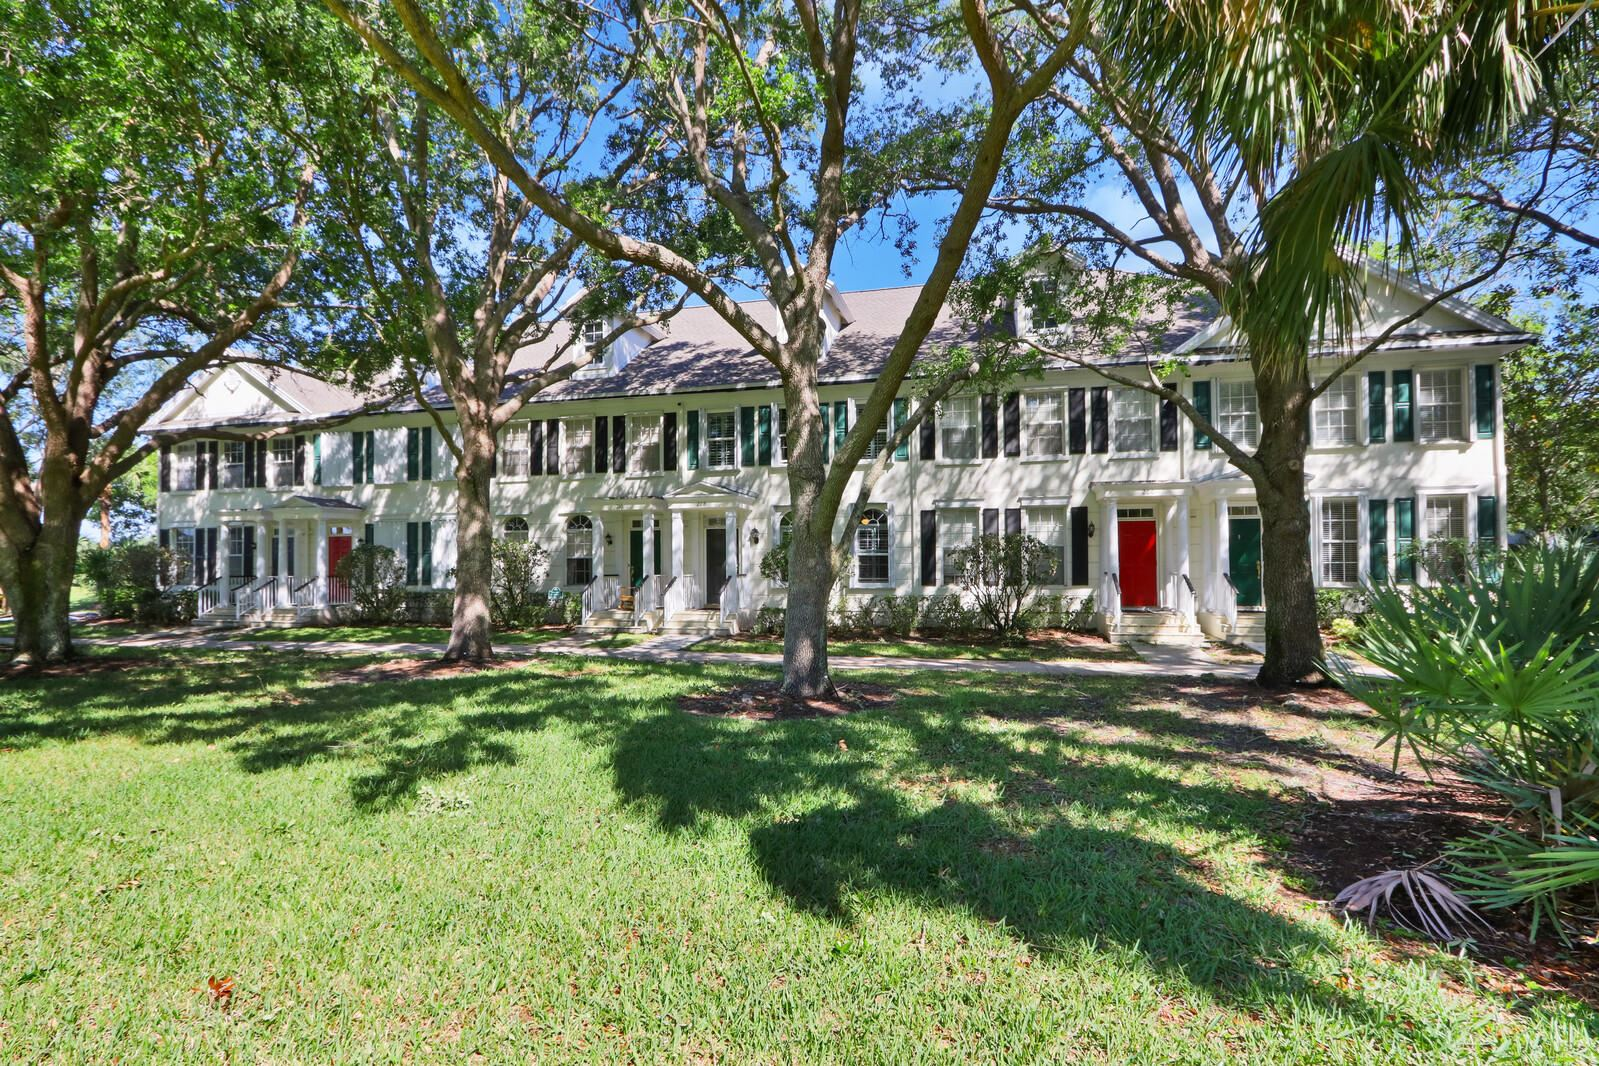 Photo of 208 Murray Court, Jupiter, FL 33458 (MLS # RX-10715110)